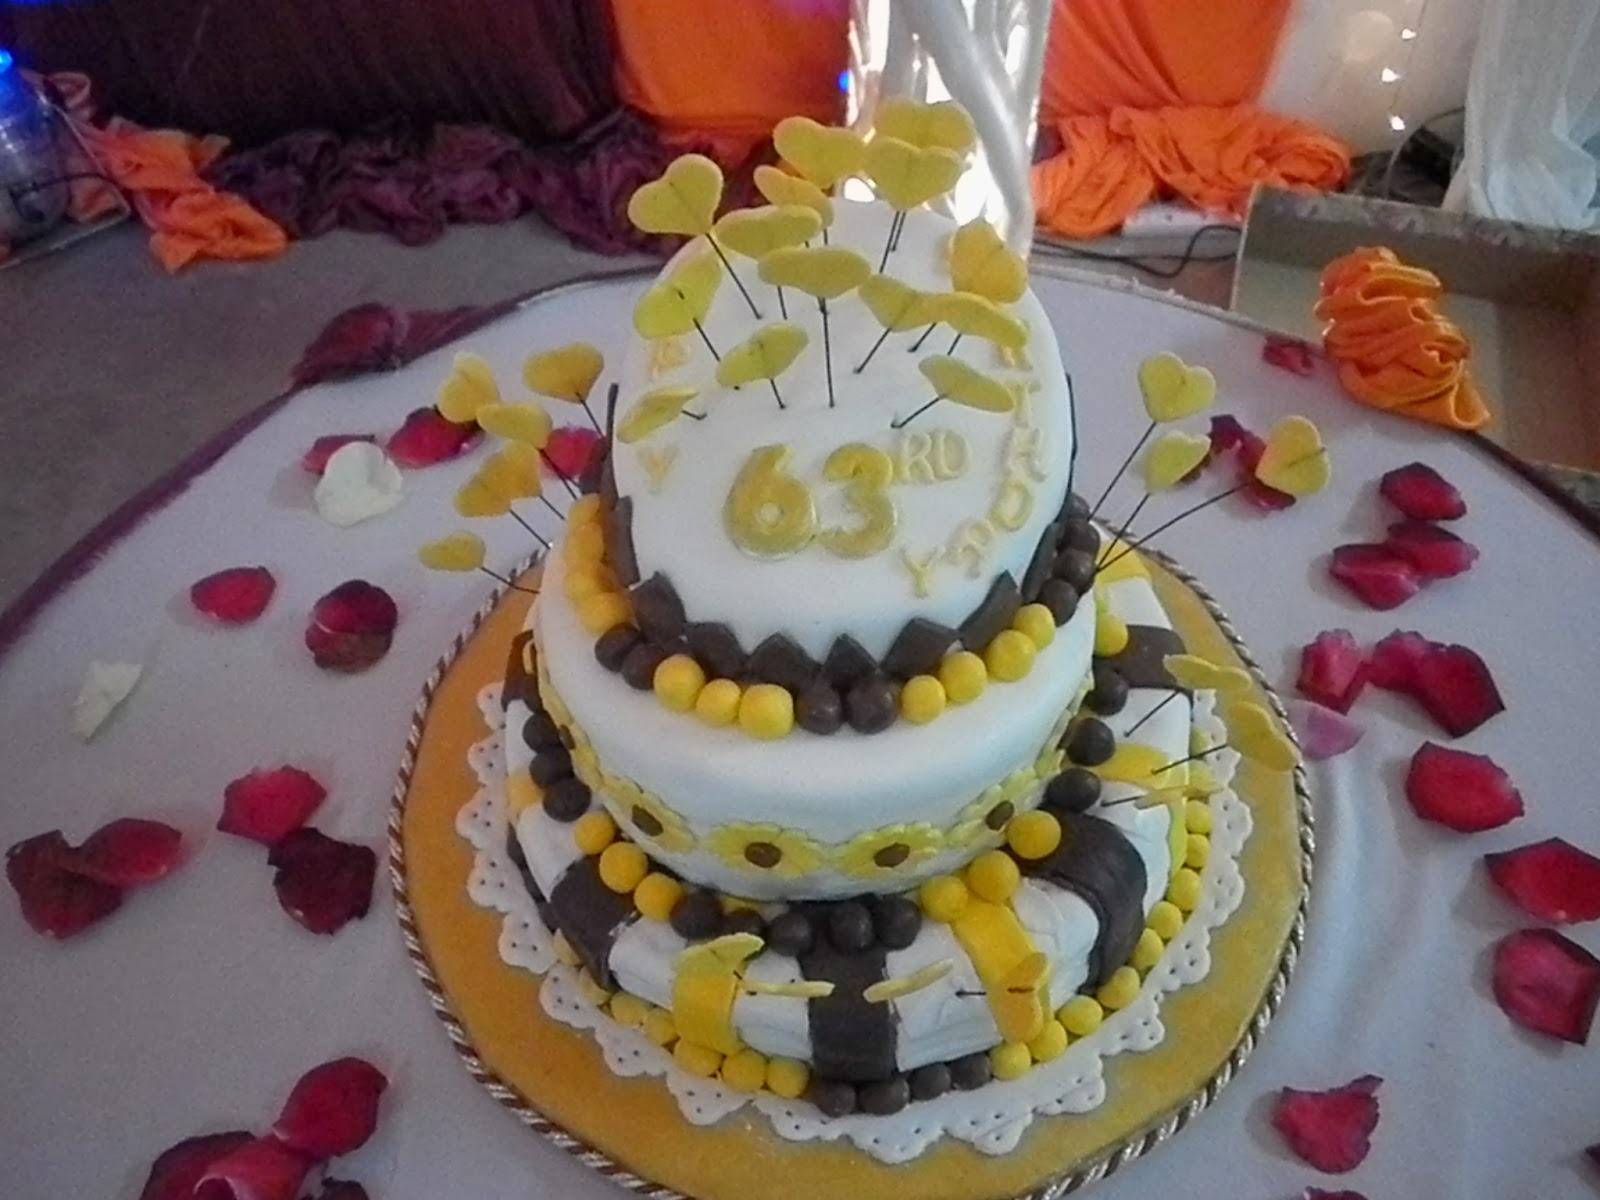 Victoriadelight 60 Years Old Birthday Cake